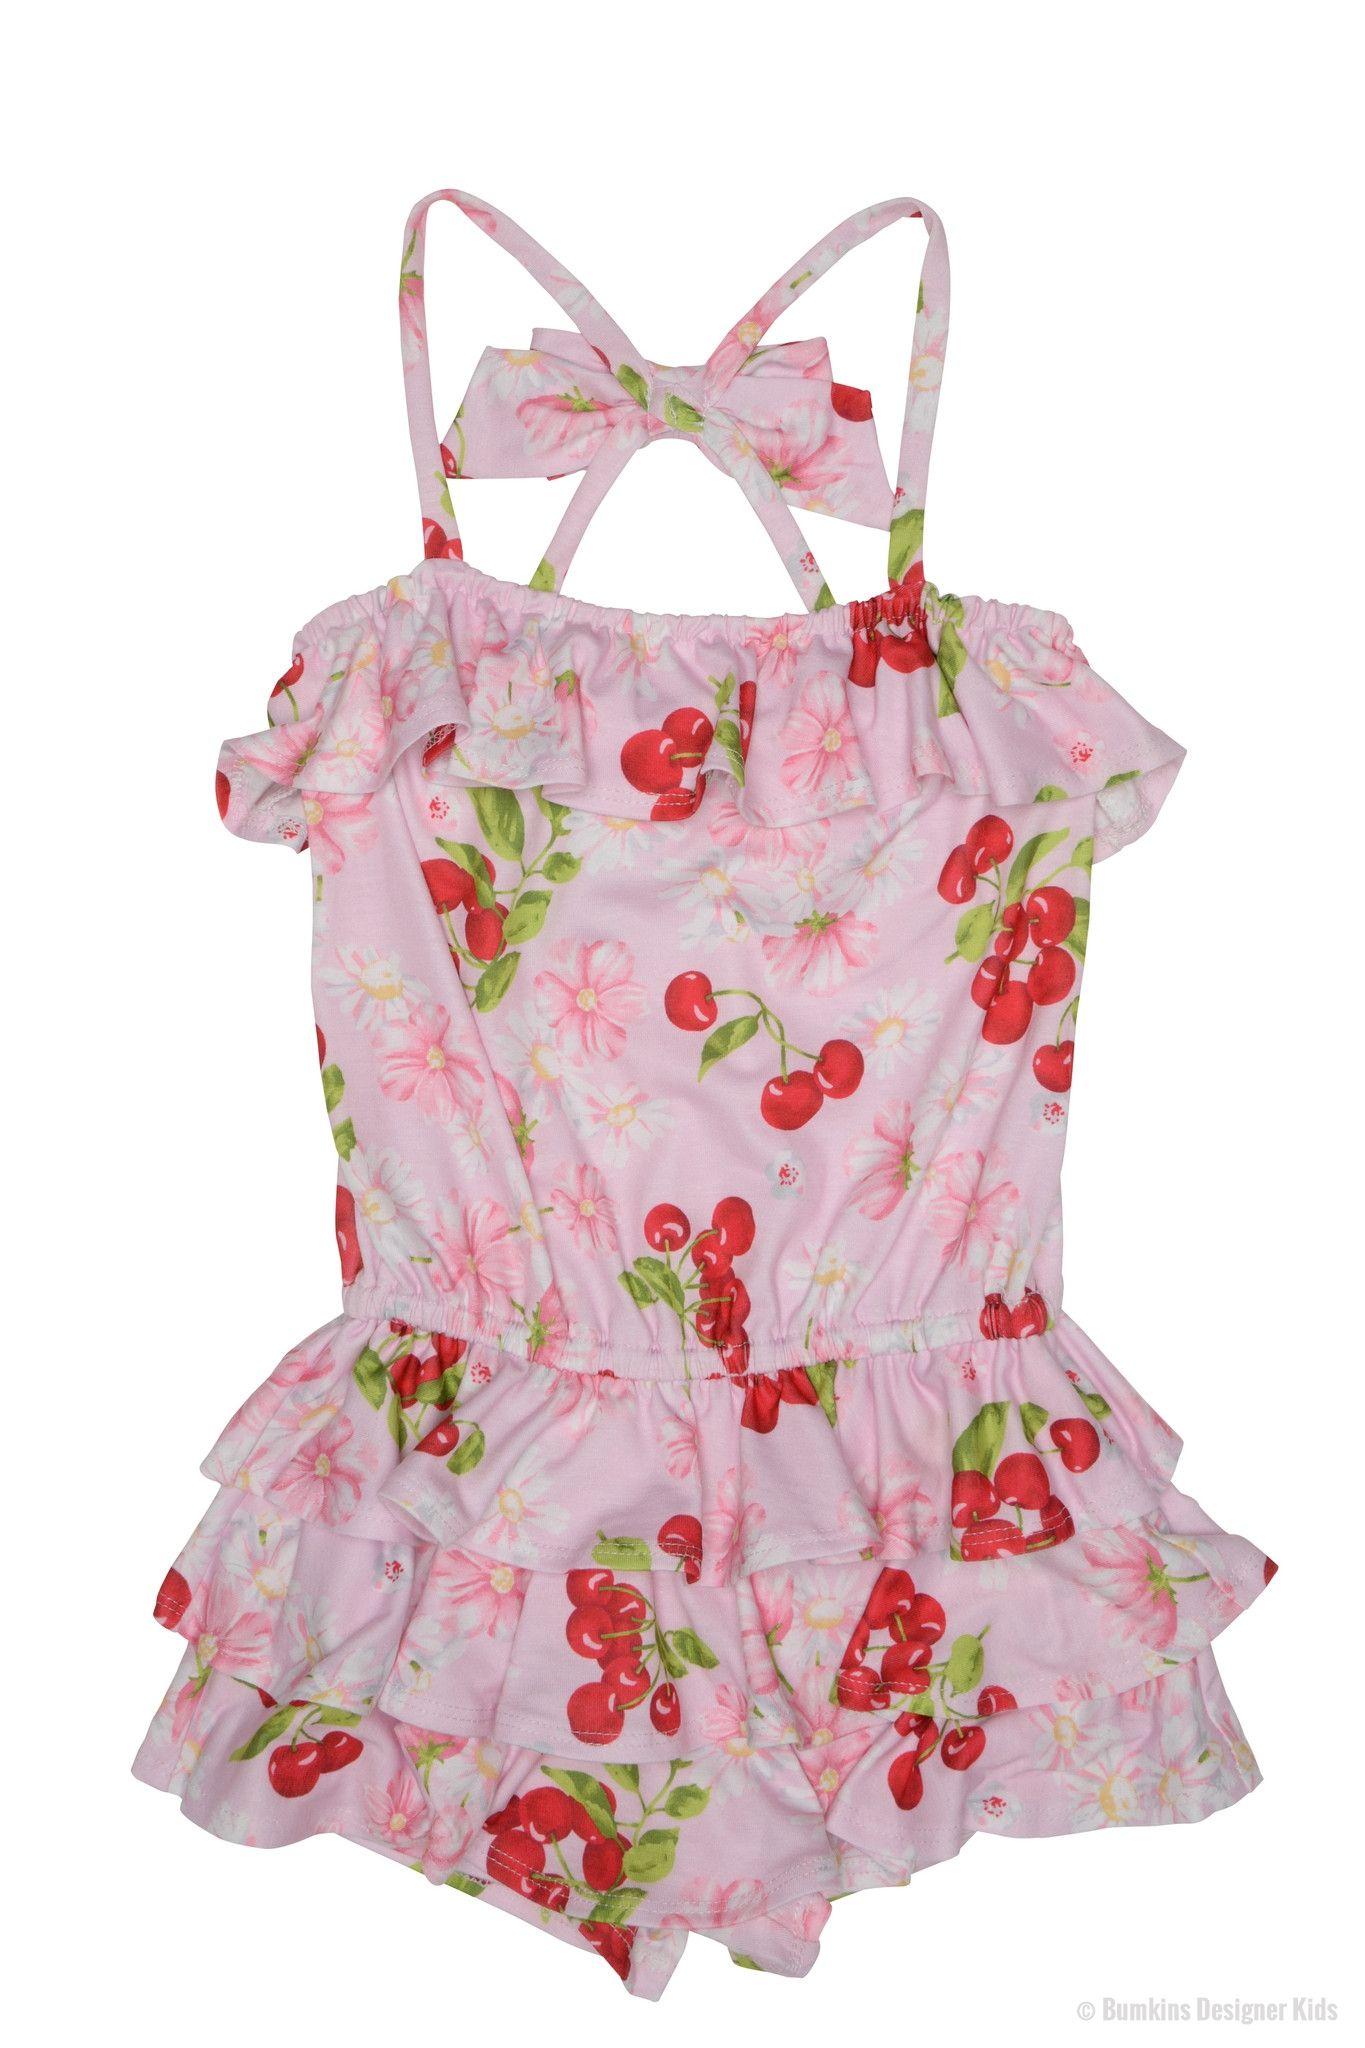 c3d275e9a6cb6 Kate Mack Cherries Jubilee Romper 579 Was £53.00 Now £37.00 | Girls ...